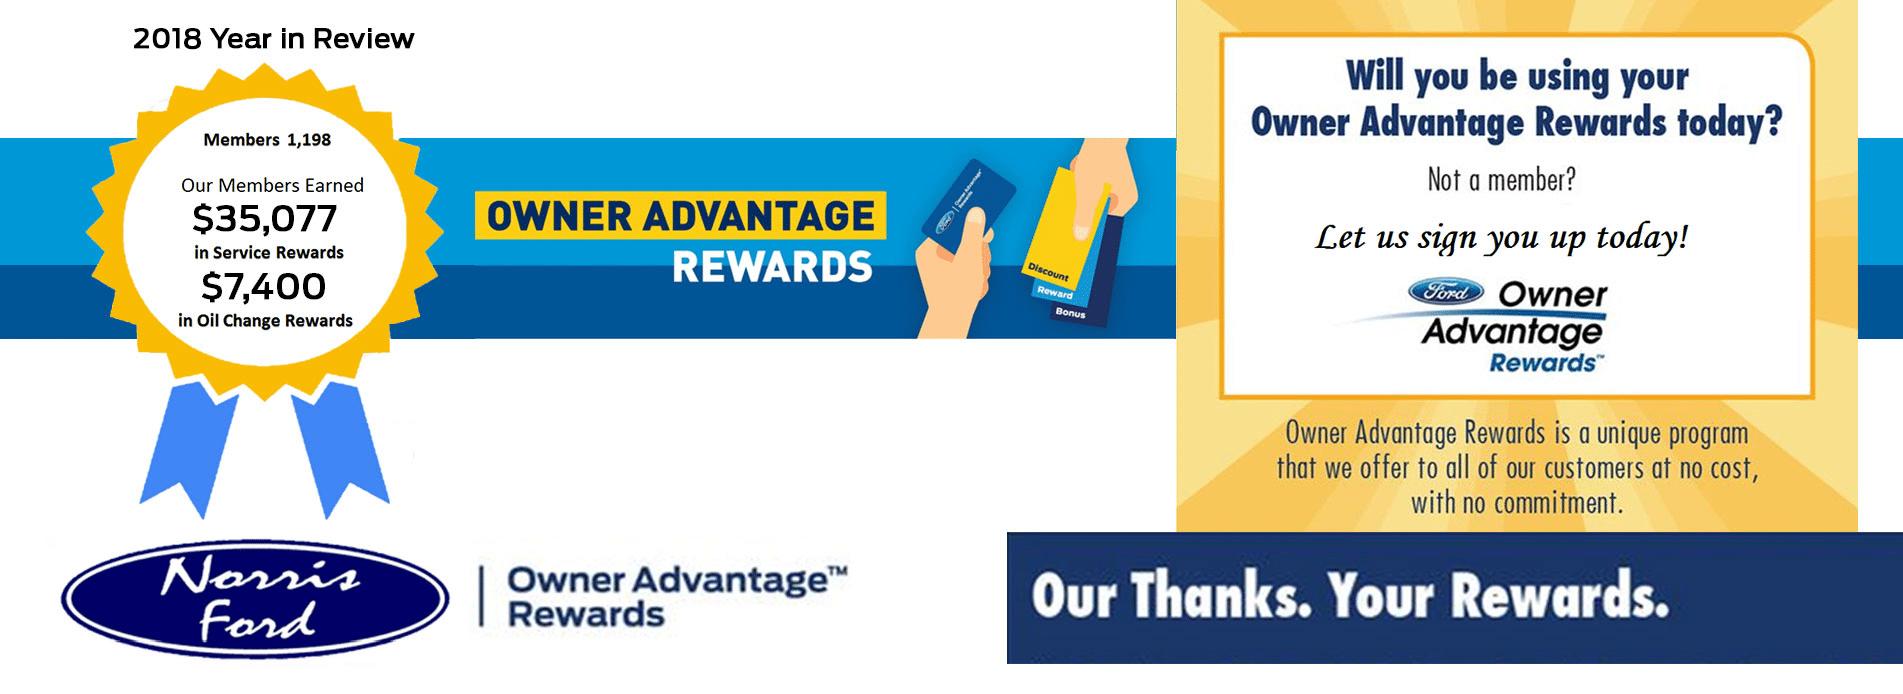 Owners Advantage